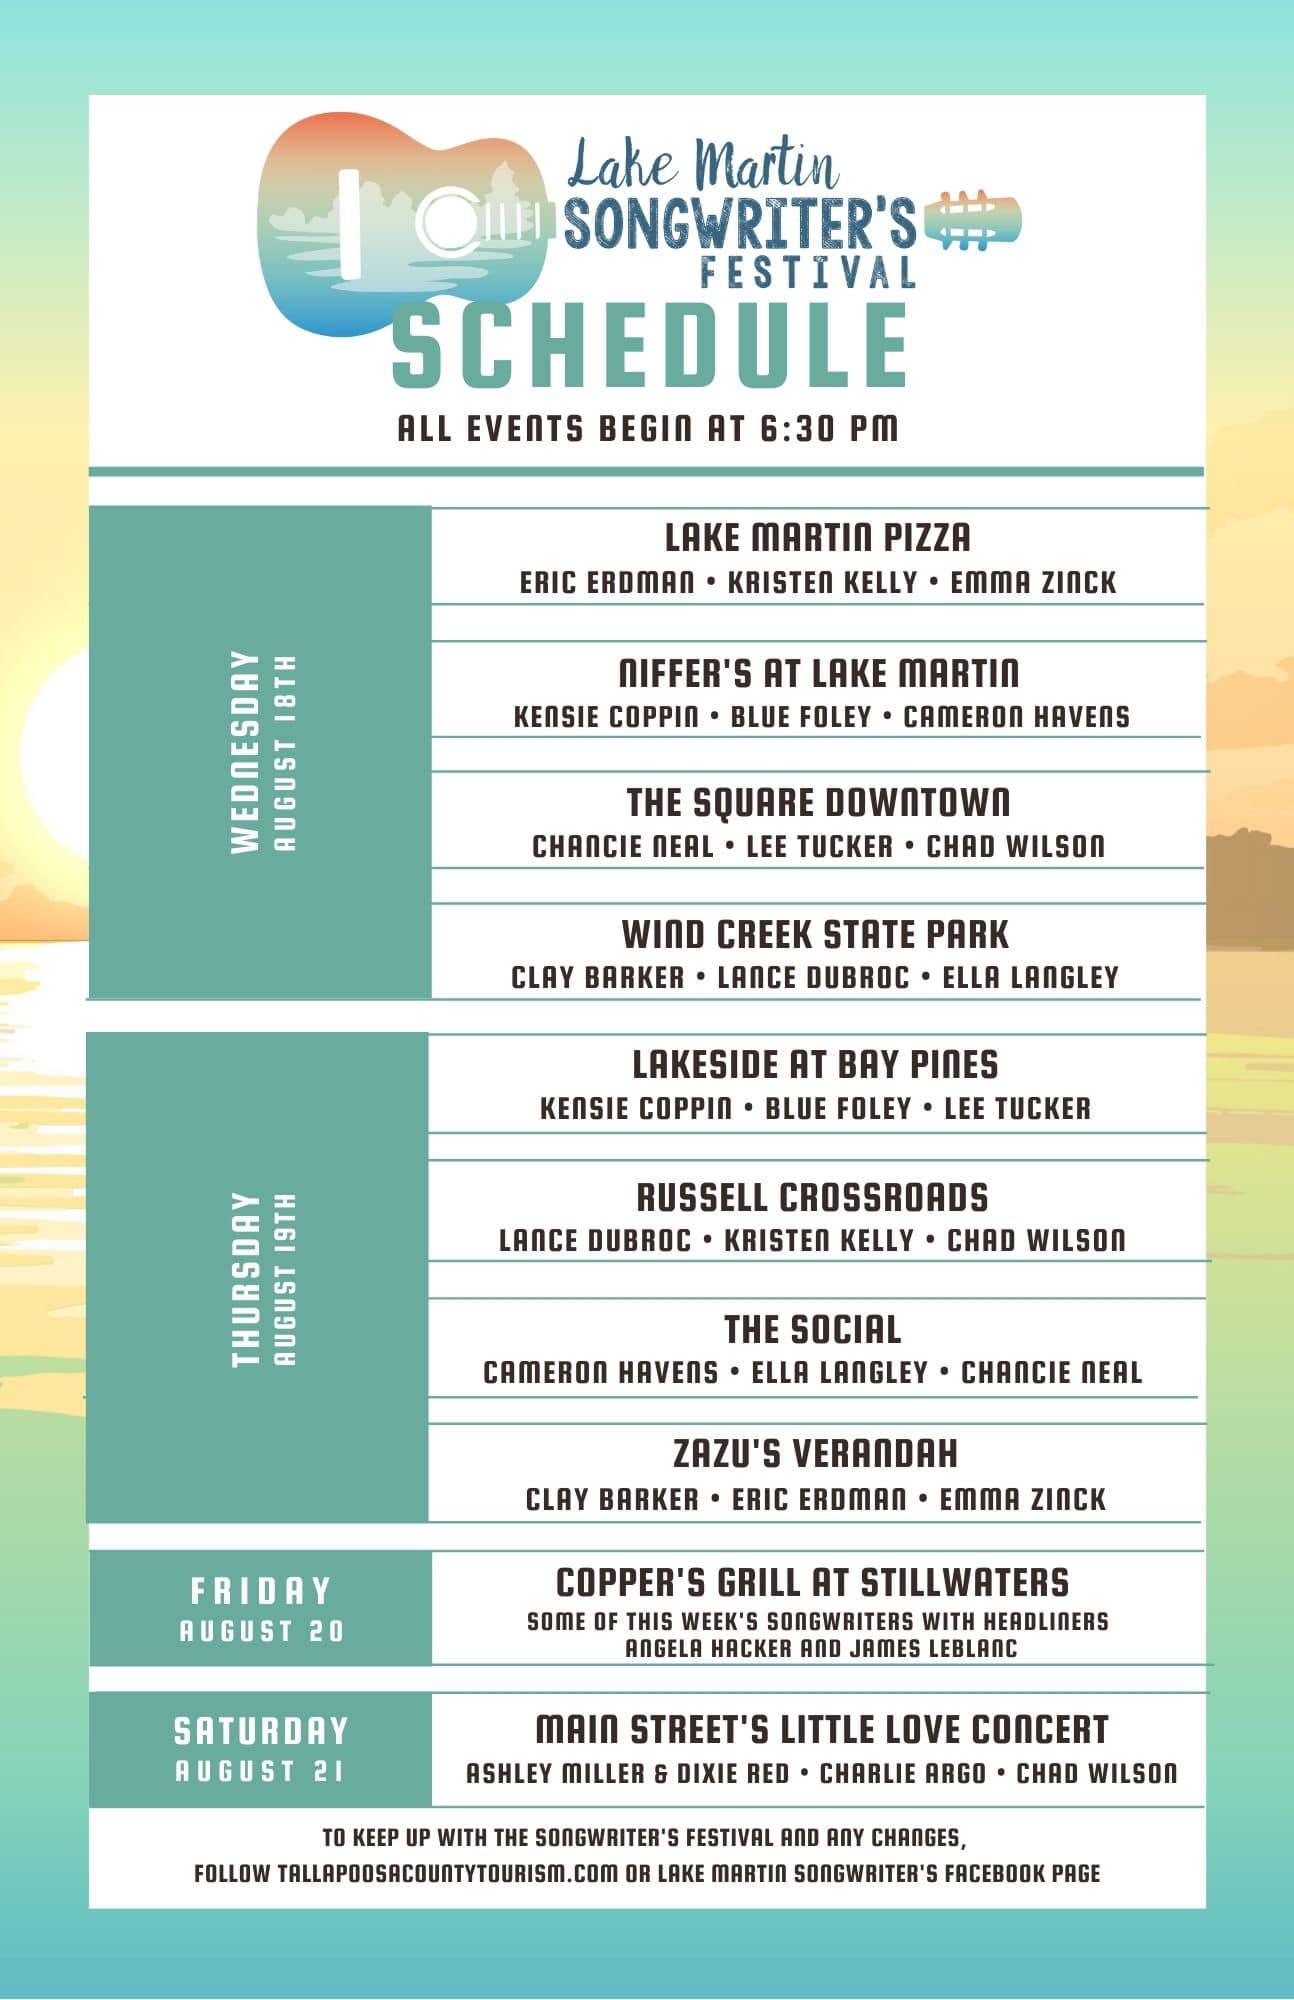 Lake Martin Songwriter's Festival @ Lake Martin Pizza Co.